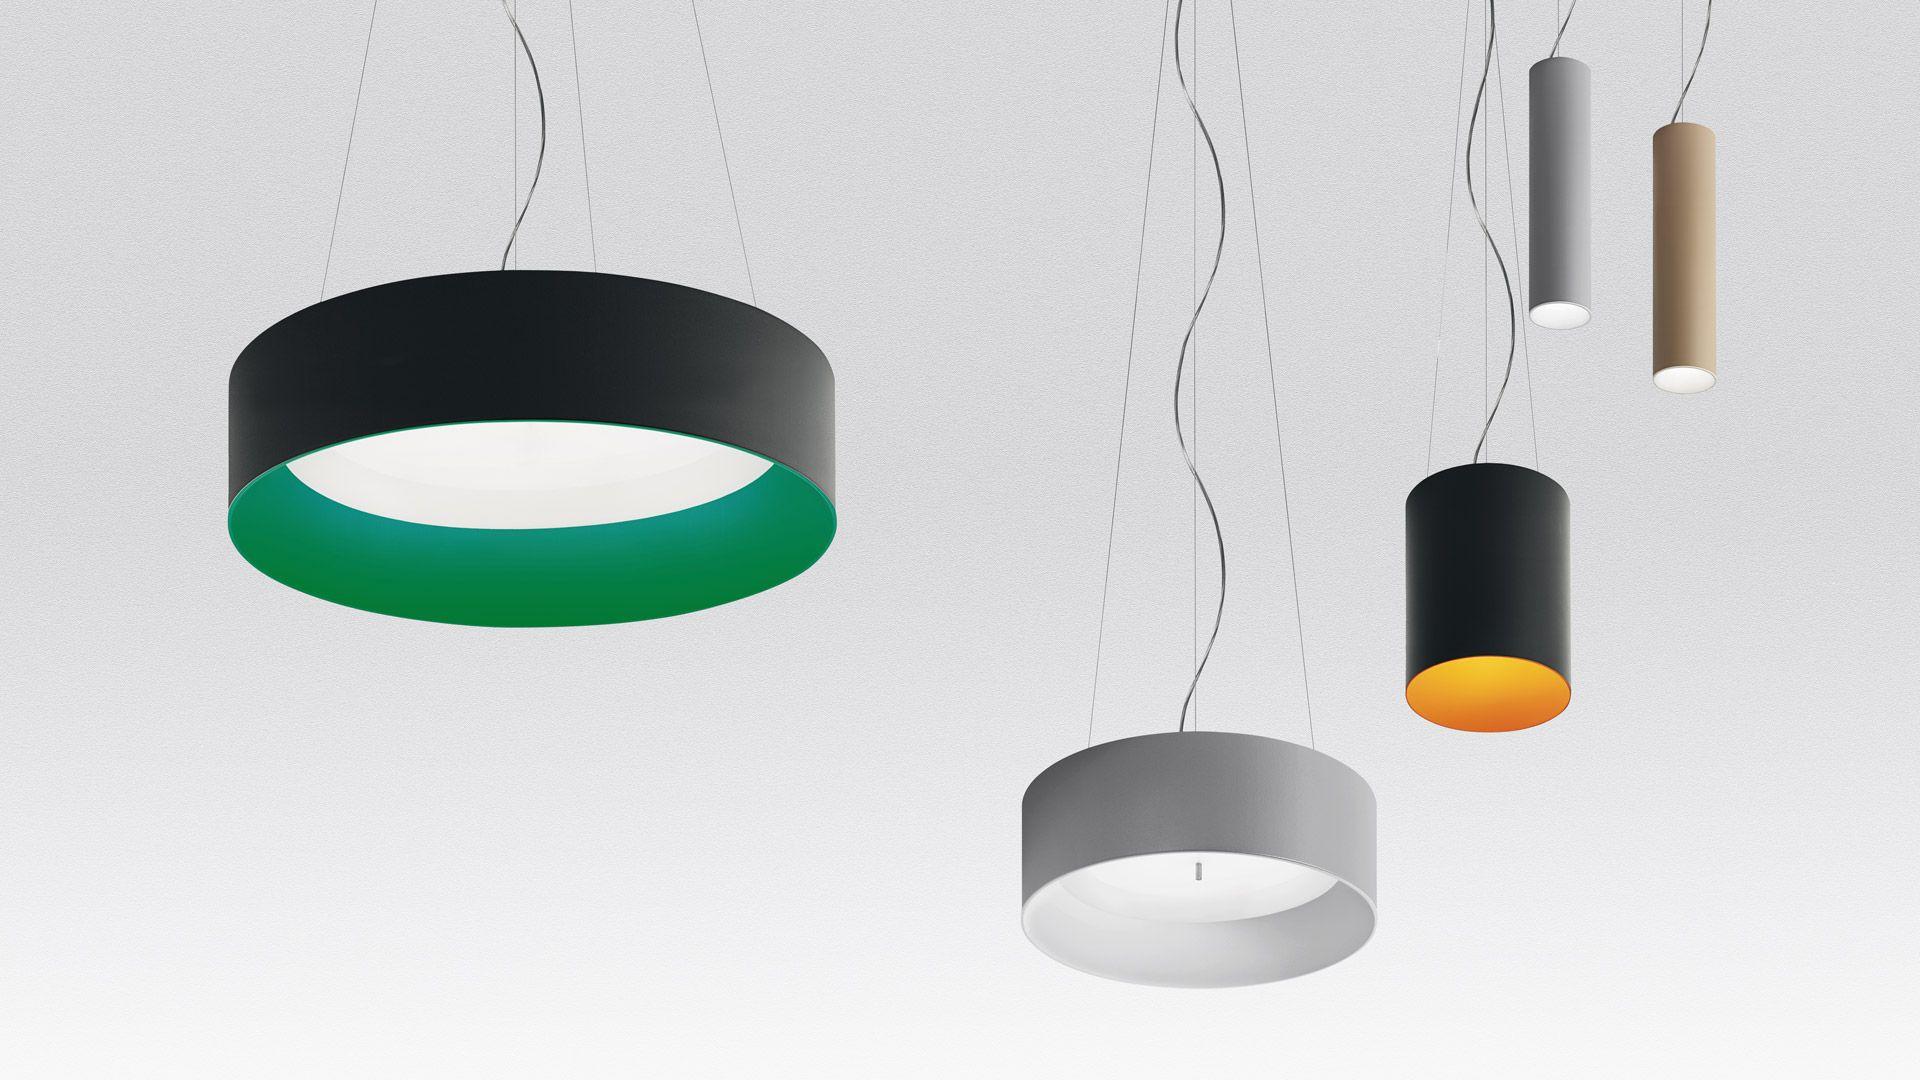 artemide tagora suspension 570 ceiling lights decor home decor